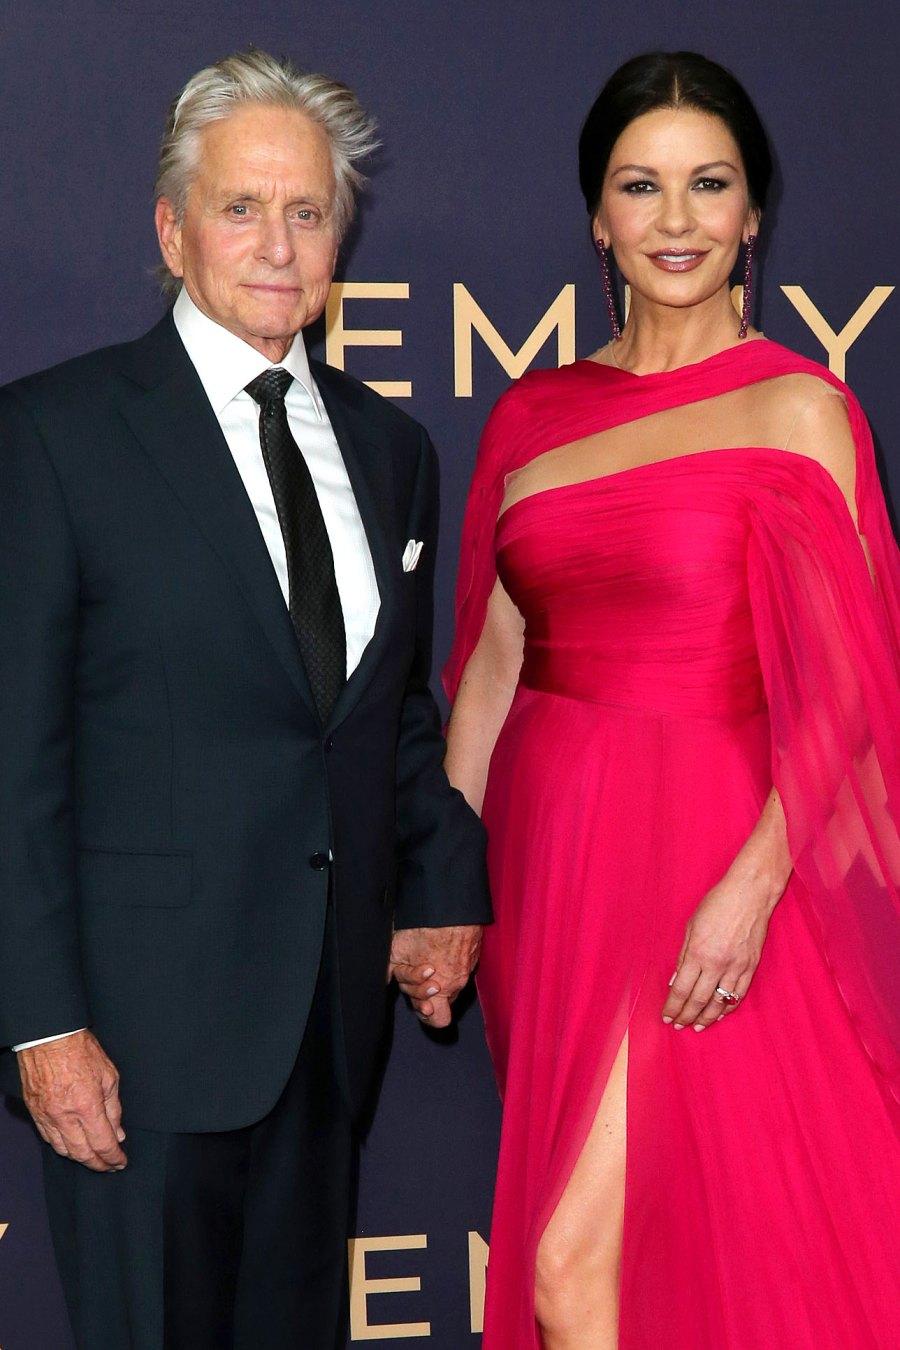 September 2020 Emmys Michael Douglas and Catherine Zeta-Jones Timeline of Their Longtime Romance